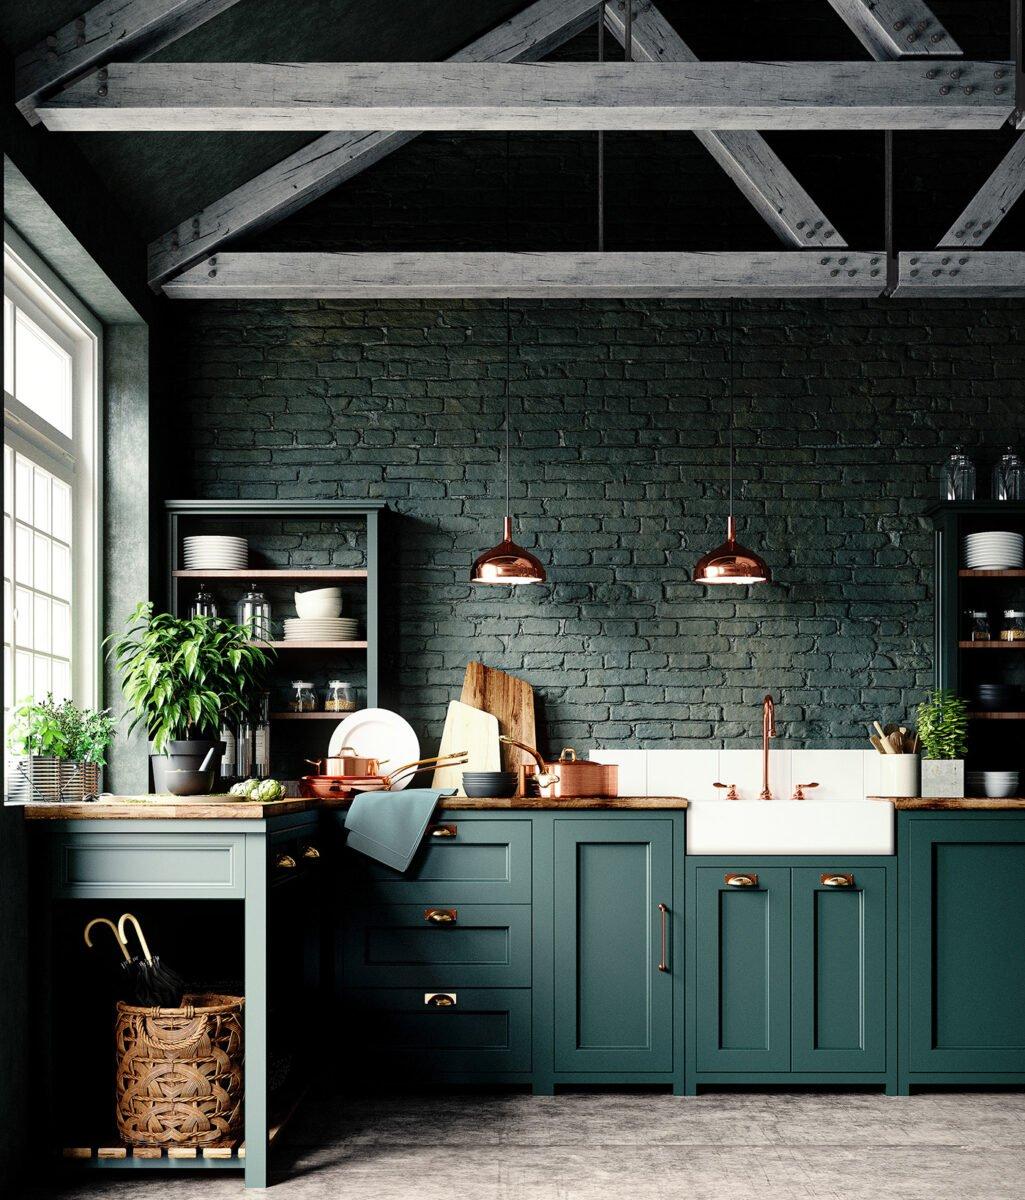 10-idee-abbellire-cucina-17